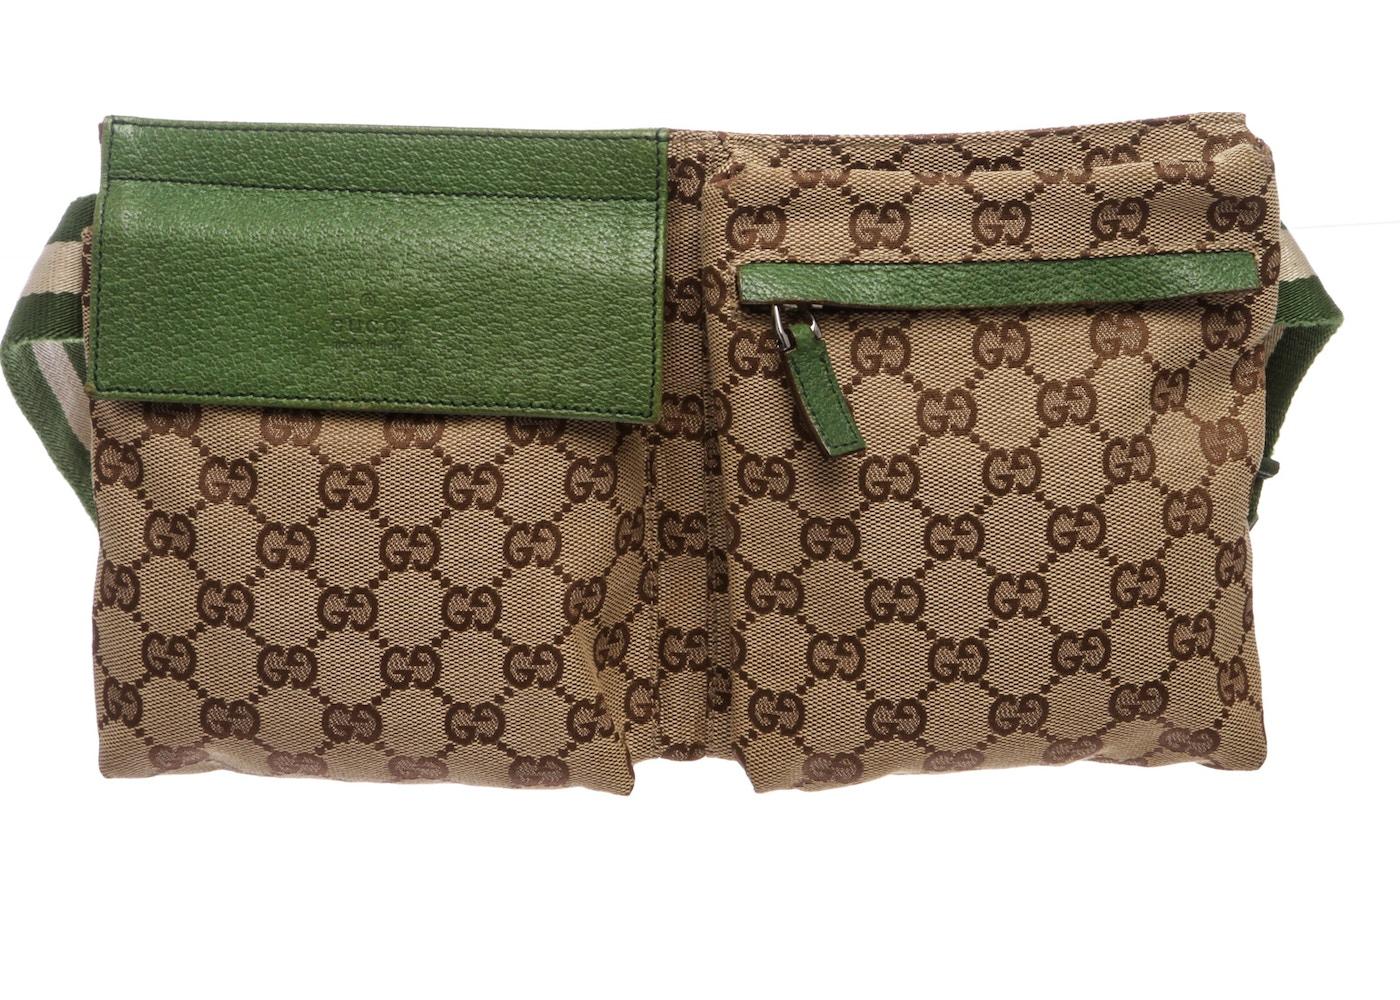 67e219a5d3c1 Gucci Flap Waist Bag GG Monogram Adjustable Belt Strap Brown ...